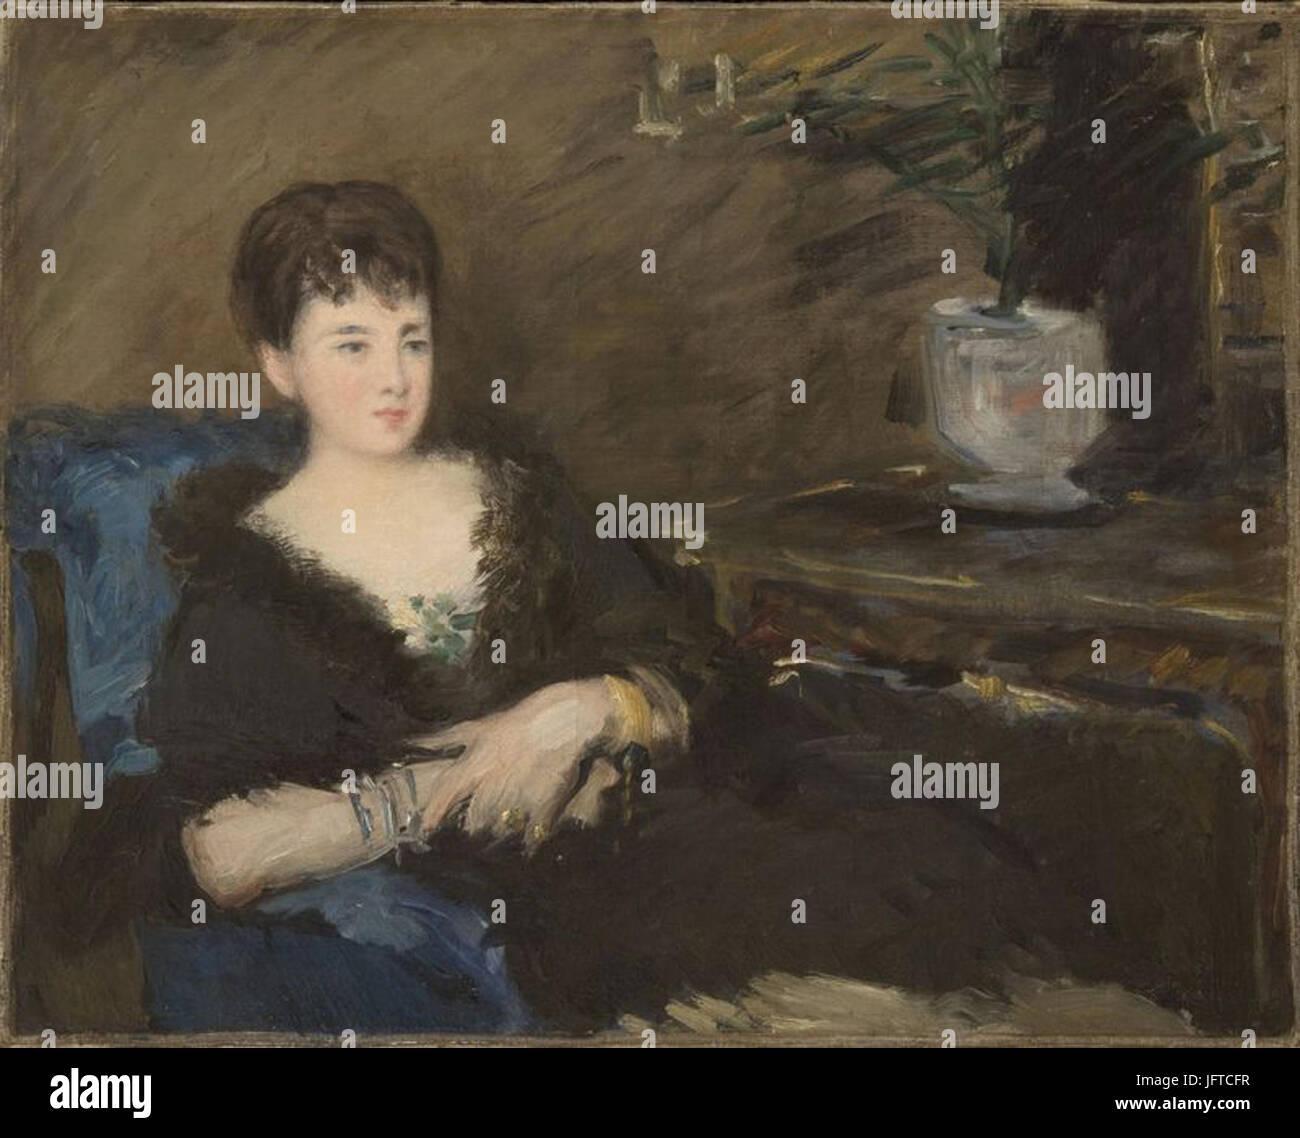 Édouard Manet - Mademoiselle Isabelle Lemmonier (RW 303) - Stock Image